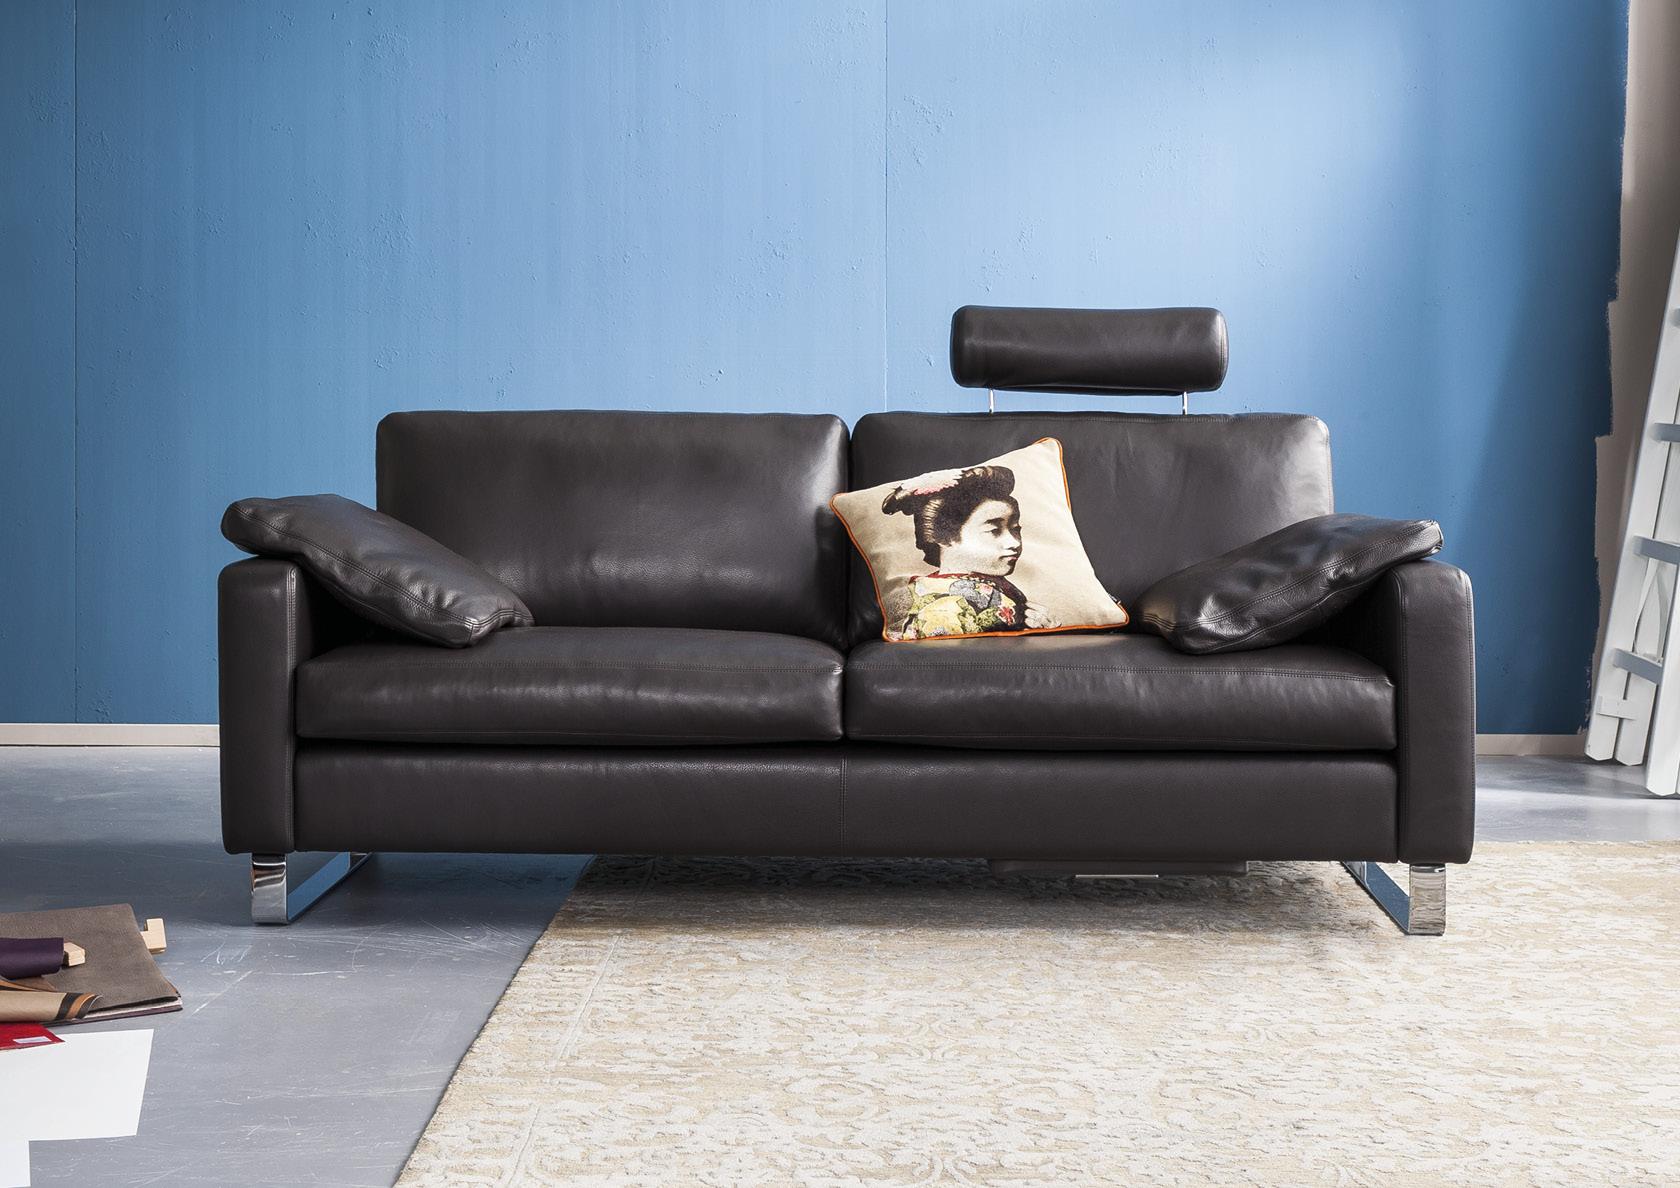 Full Size of Artnova Sofa Arten Wiki Artena Sofascore Polsterung Lounge Stoff Lederarten Bezug Welche Gibt Es Leder Couch Avellino Sofas Mbelhaus H Zeppenfeld Gmbh Sofa Sofa Arten